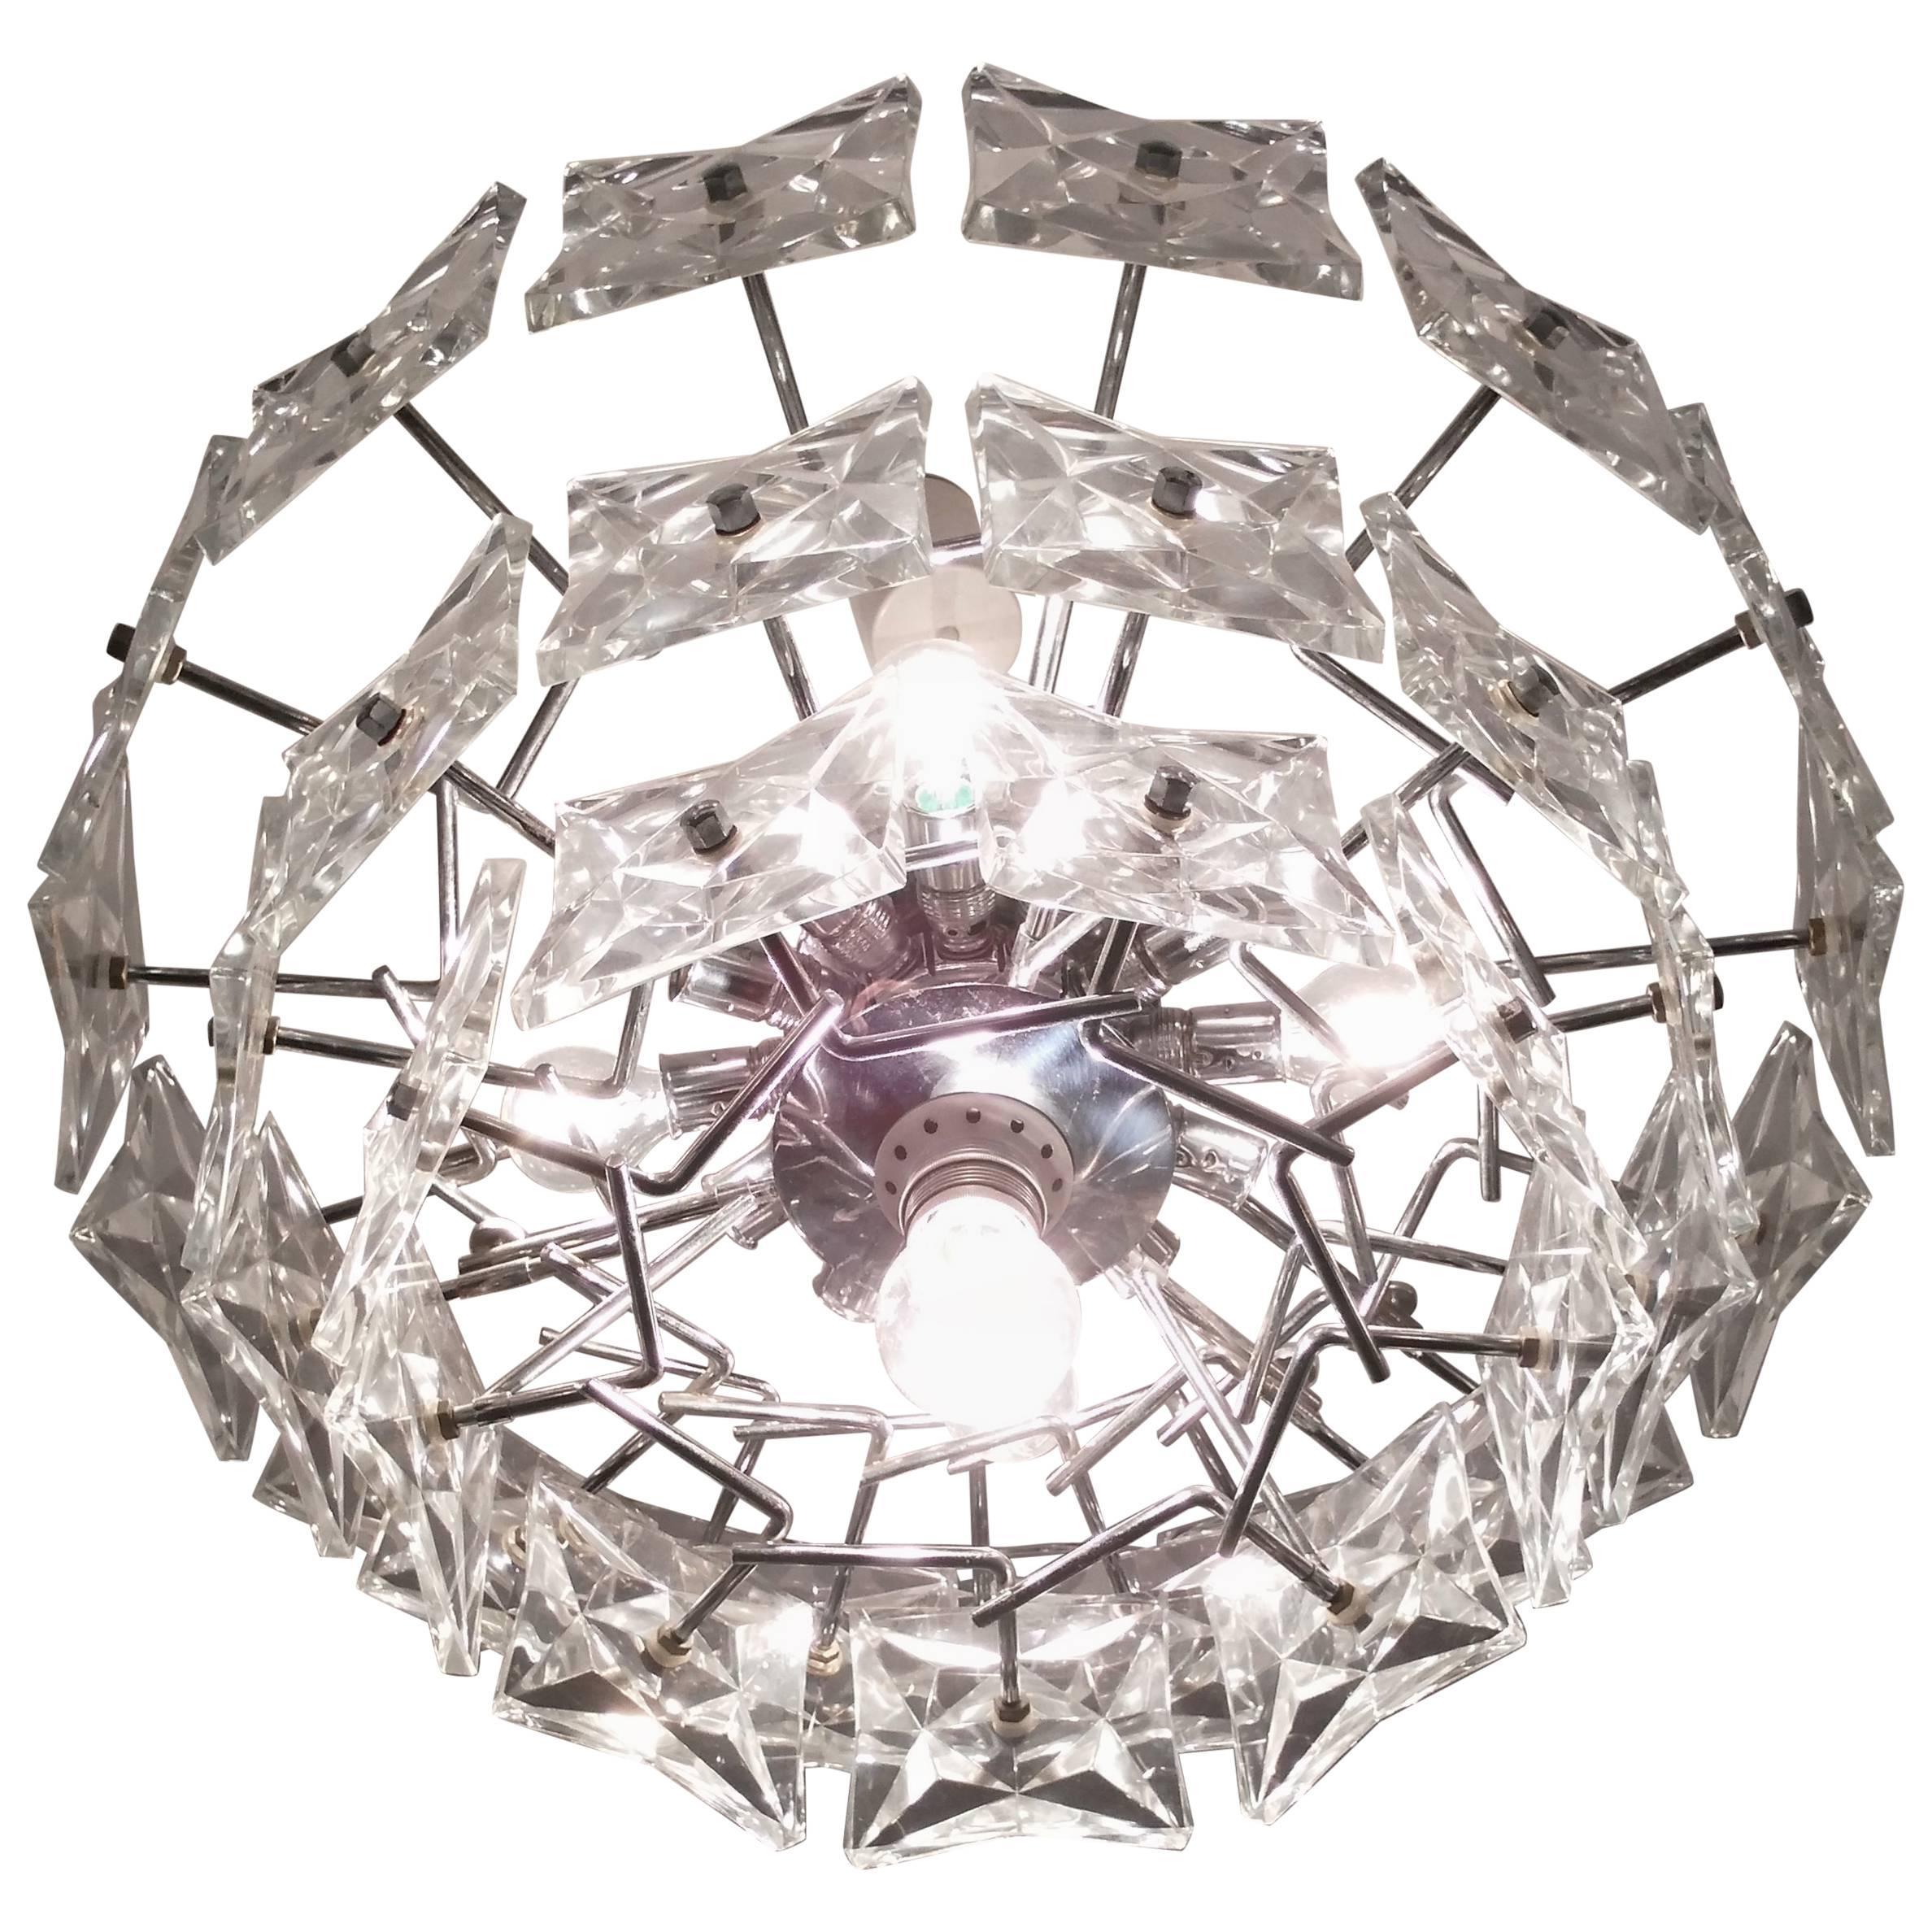 Big Design Glass Chandelier - Kinkeldey